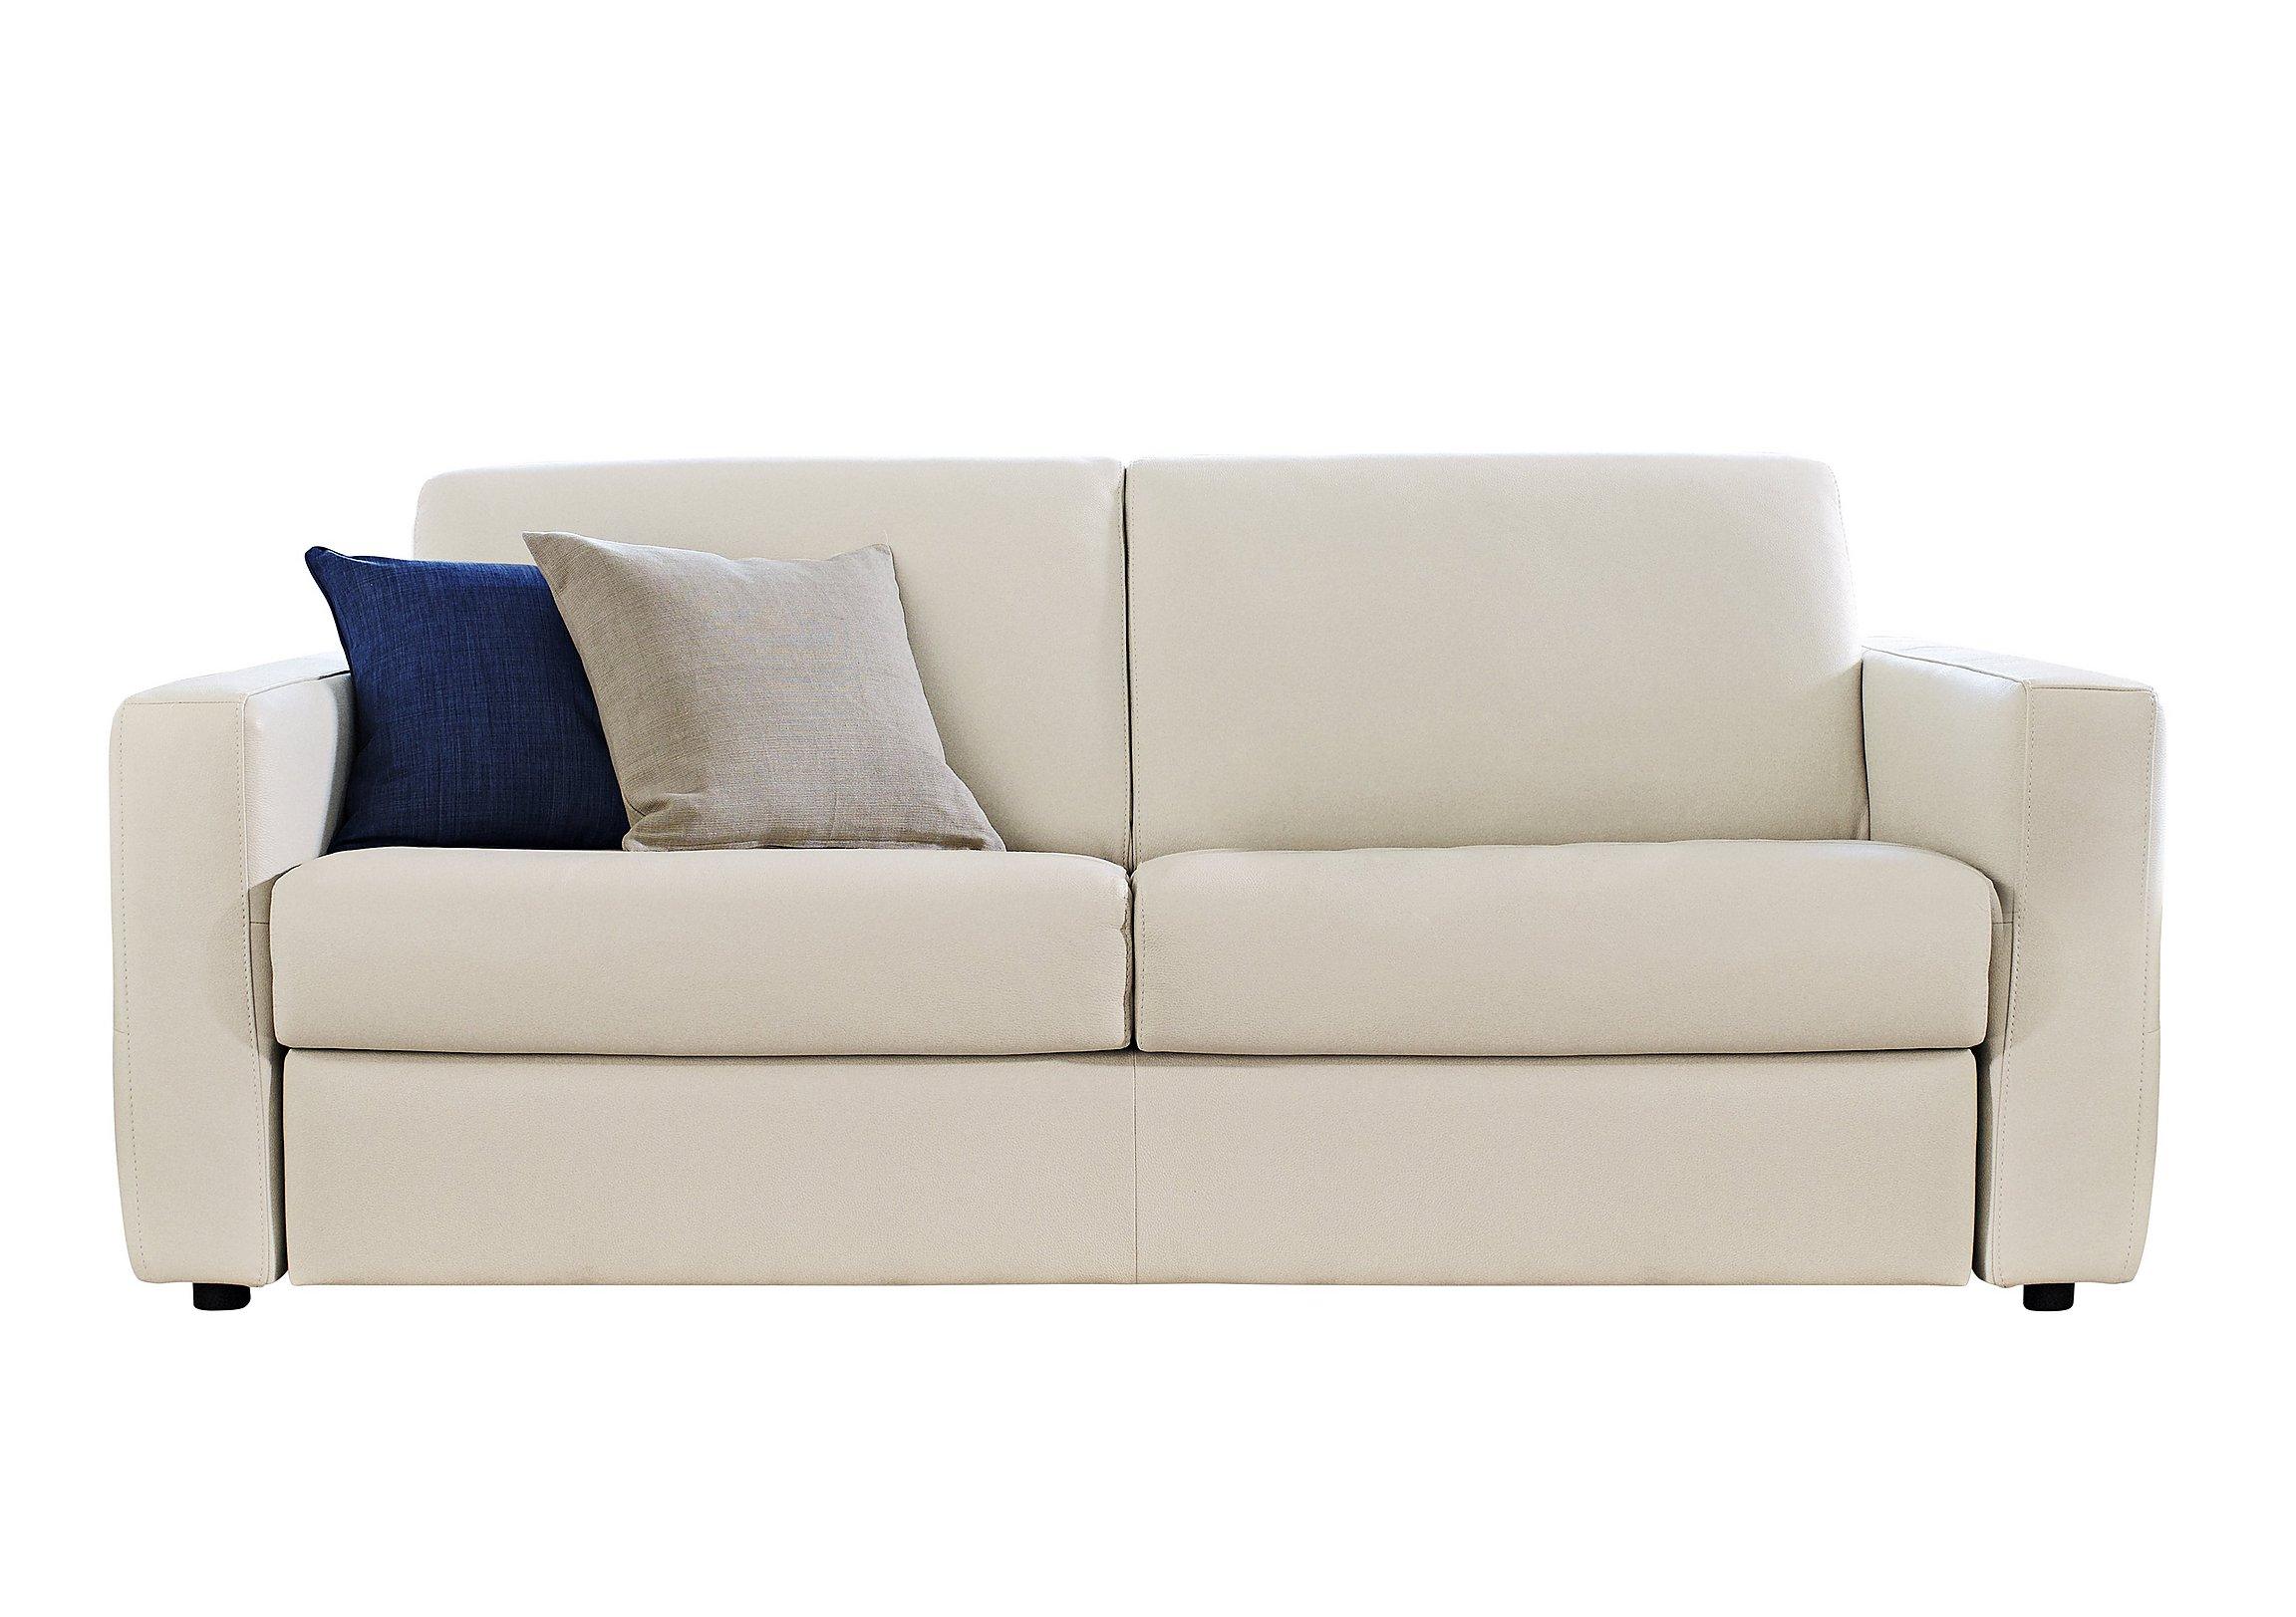 Arona Seater Leather Sofa Natuzzi Editions Furniture Village